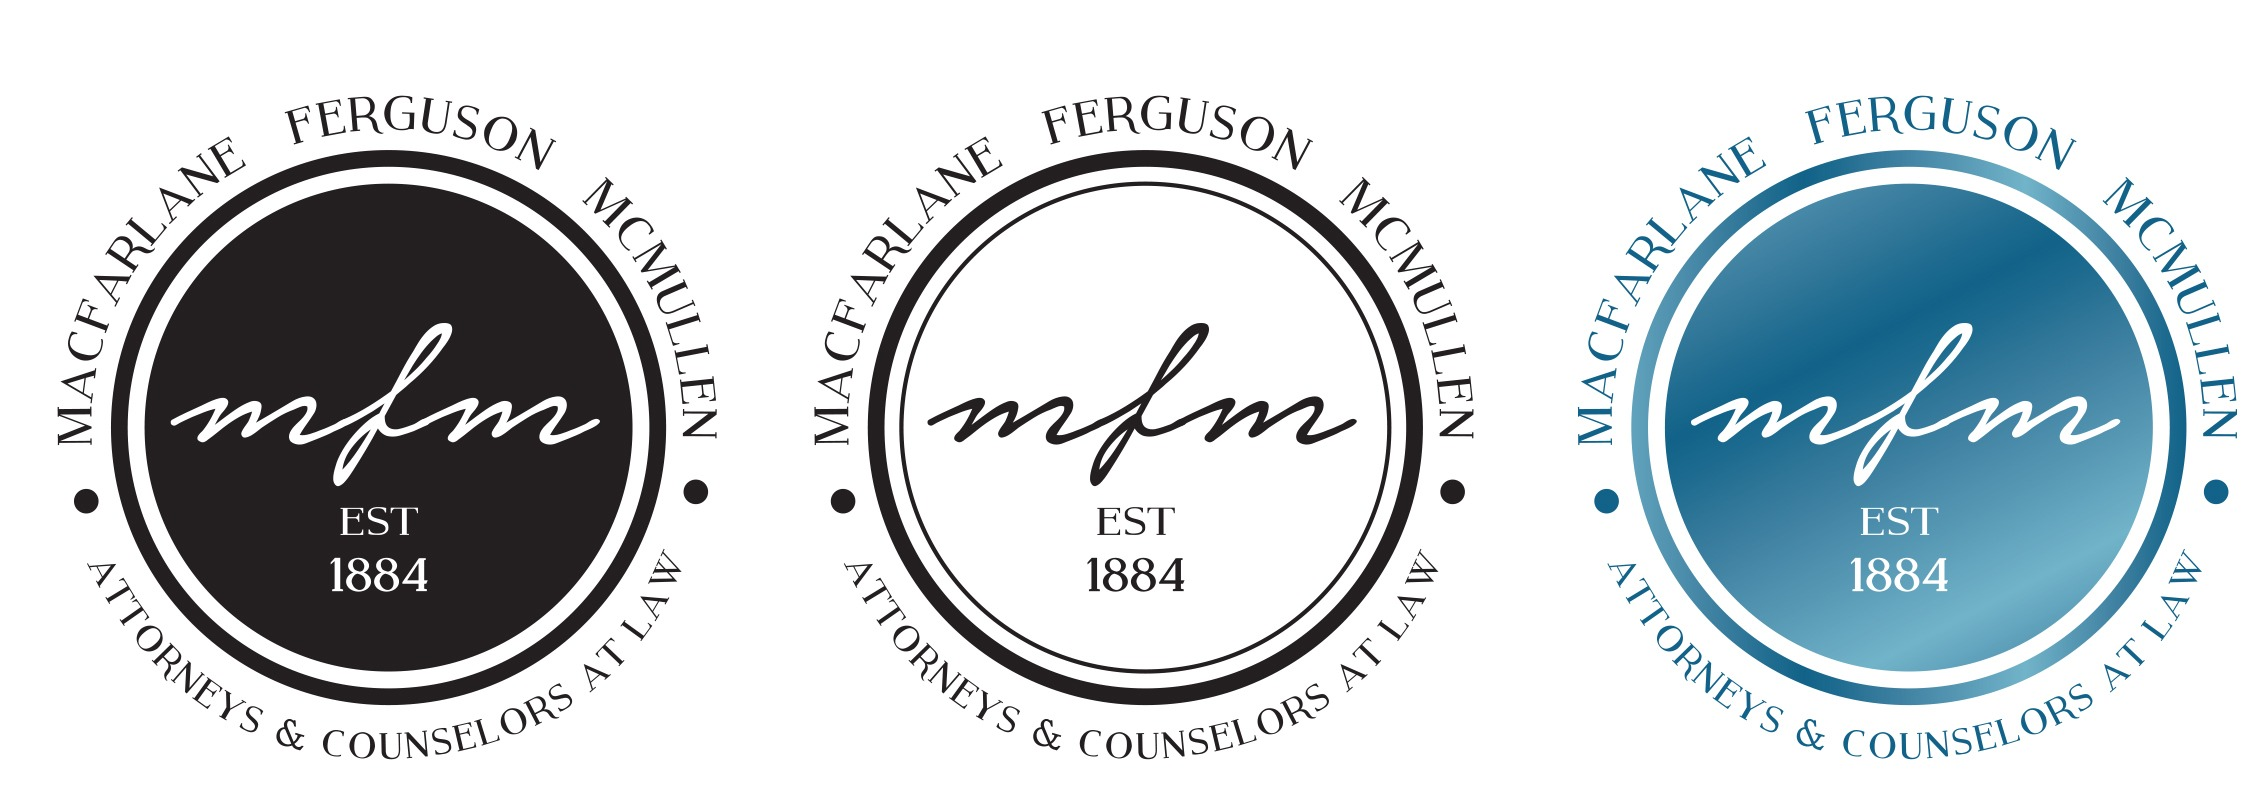 Tampa Bay law firm branding